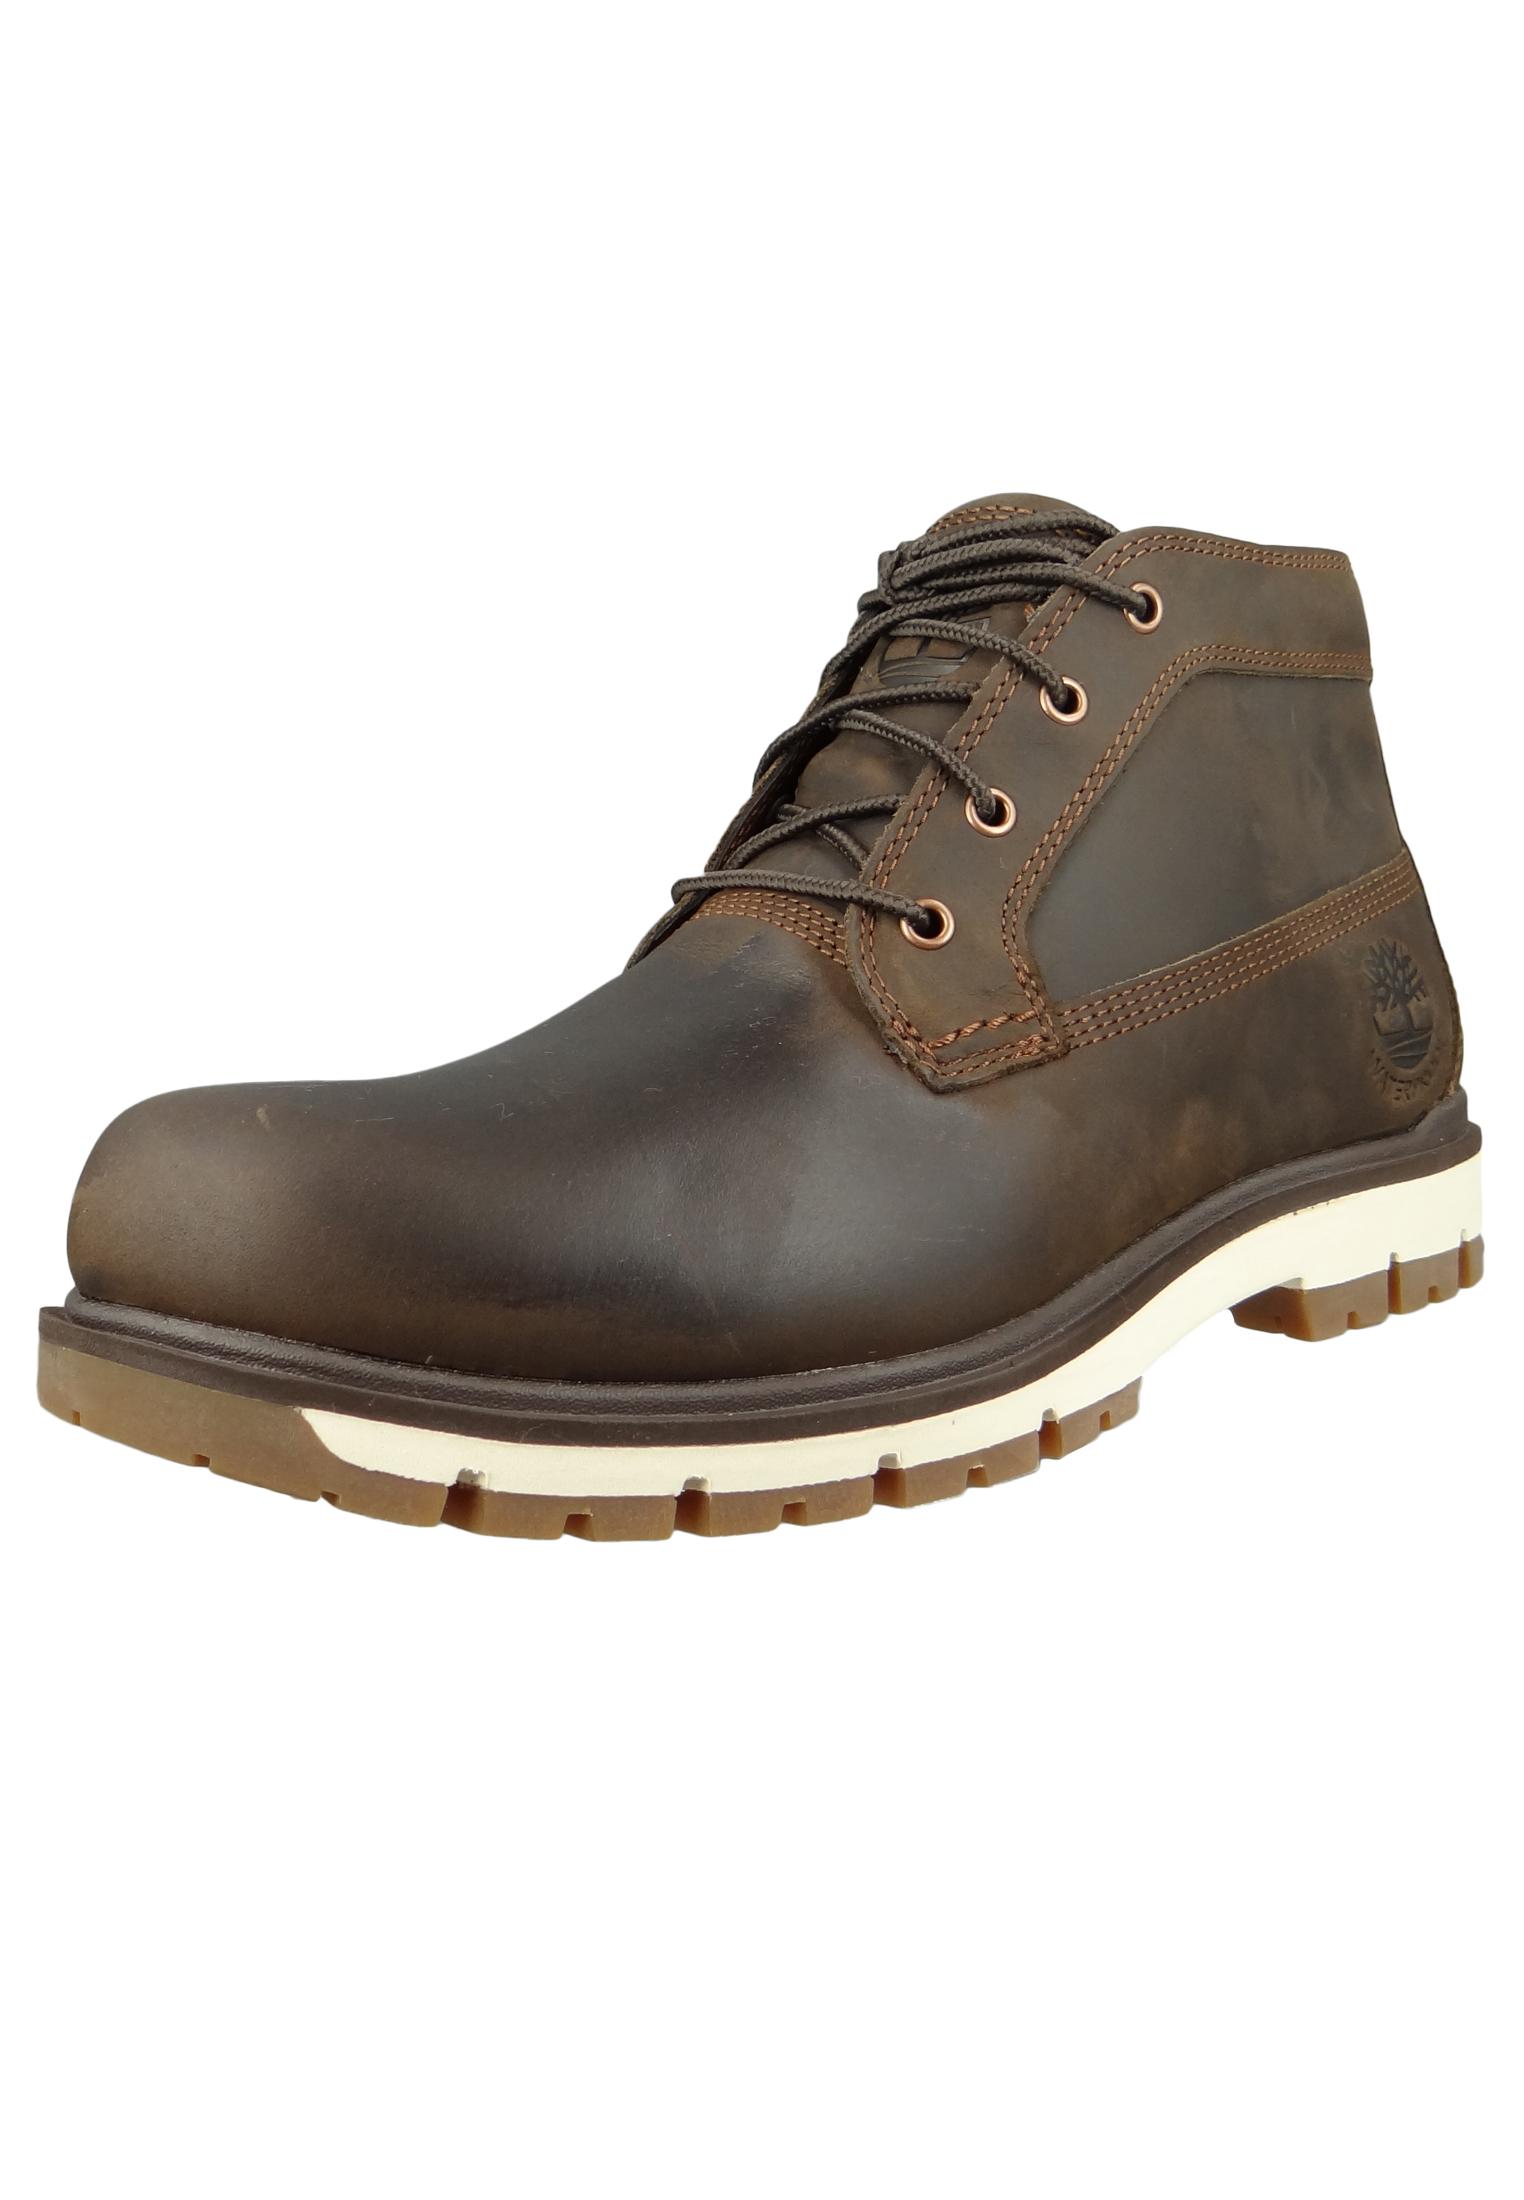 promo code 4966b 859c2 Timberland Herren Schnürschuhe Radford PT Chukka WP Boots Braun Leder  Potting Soil A1UOW